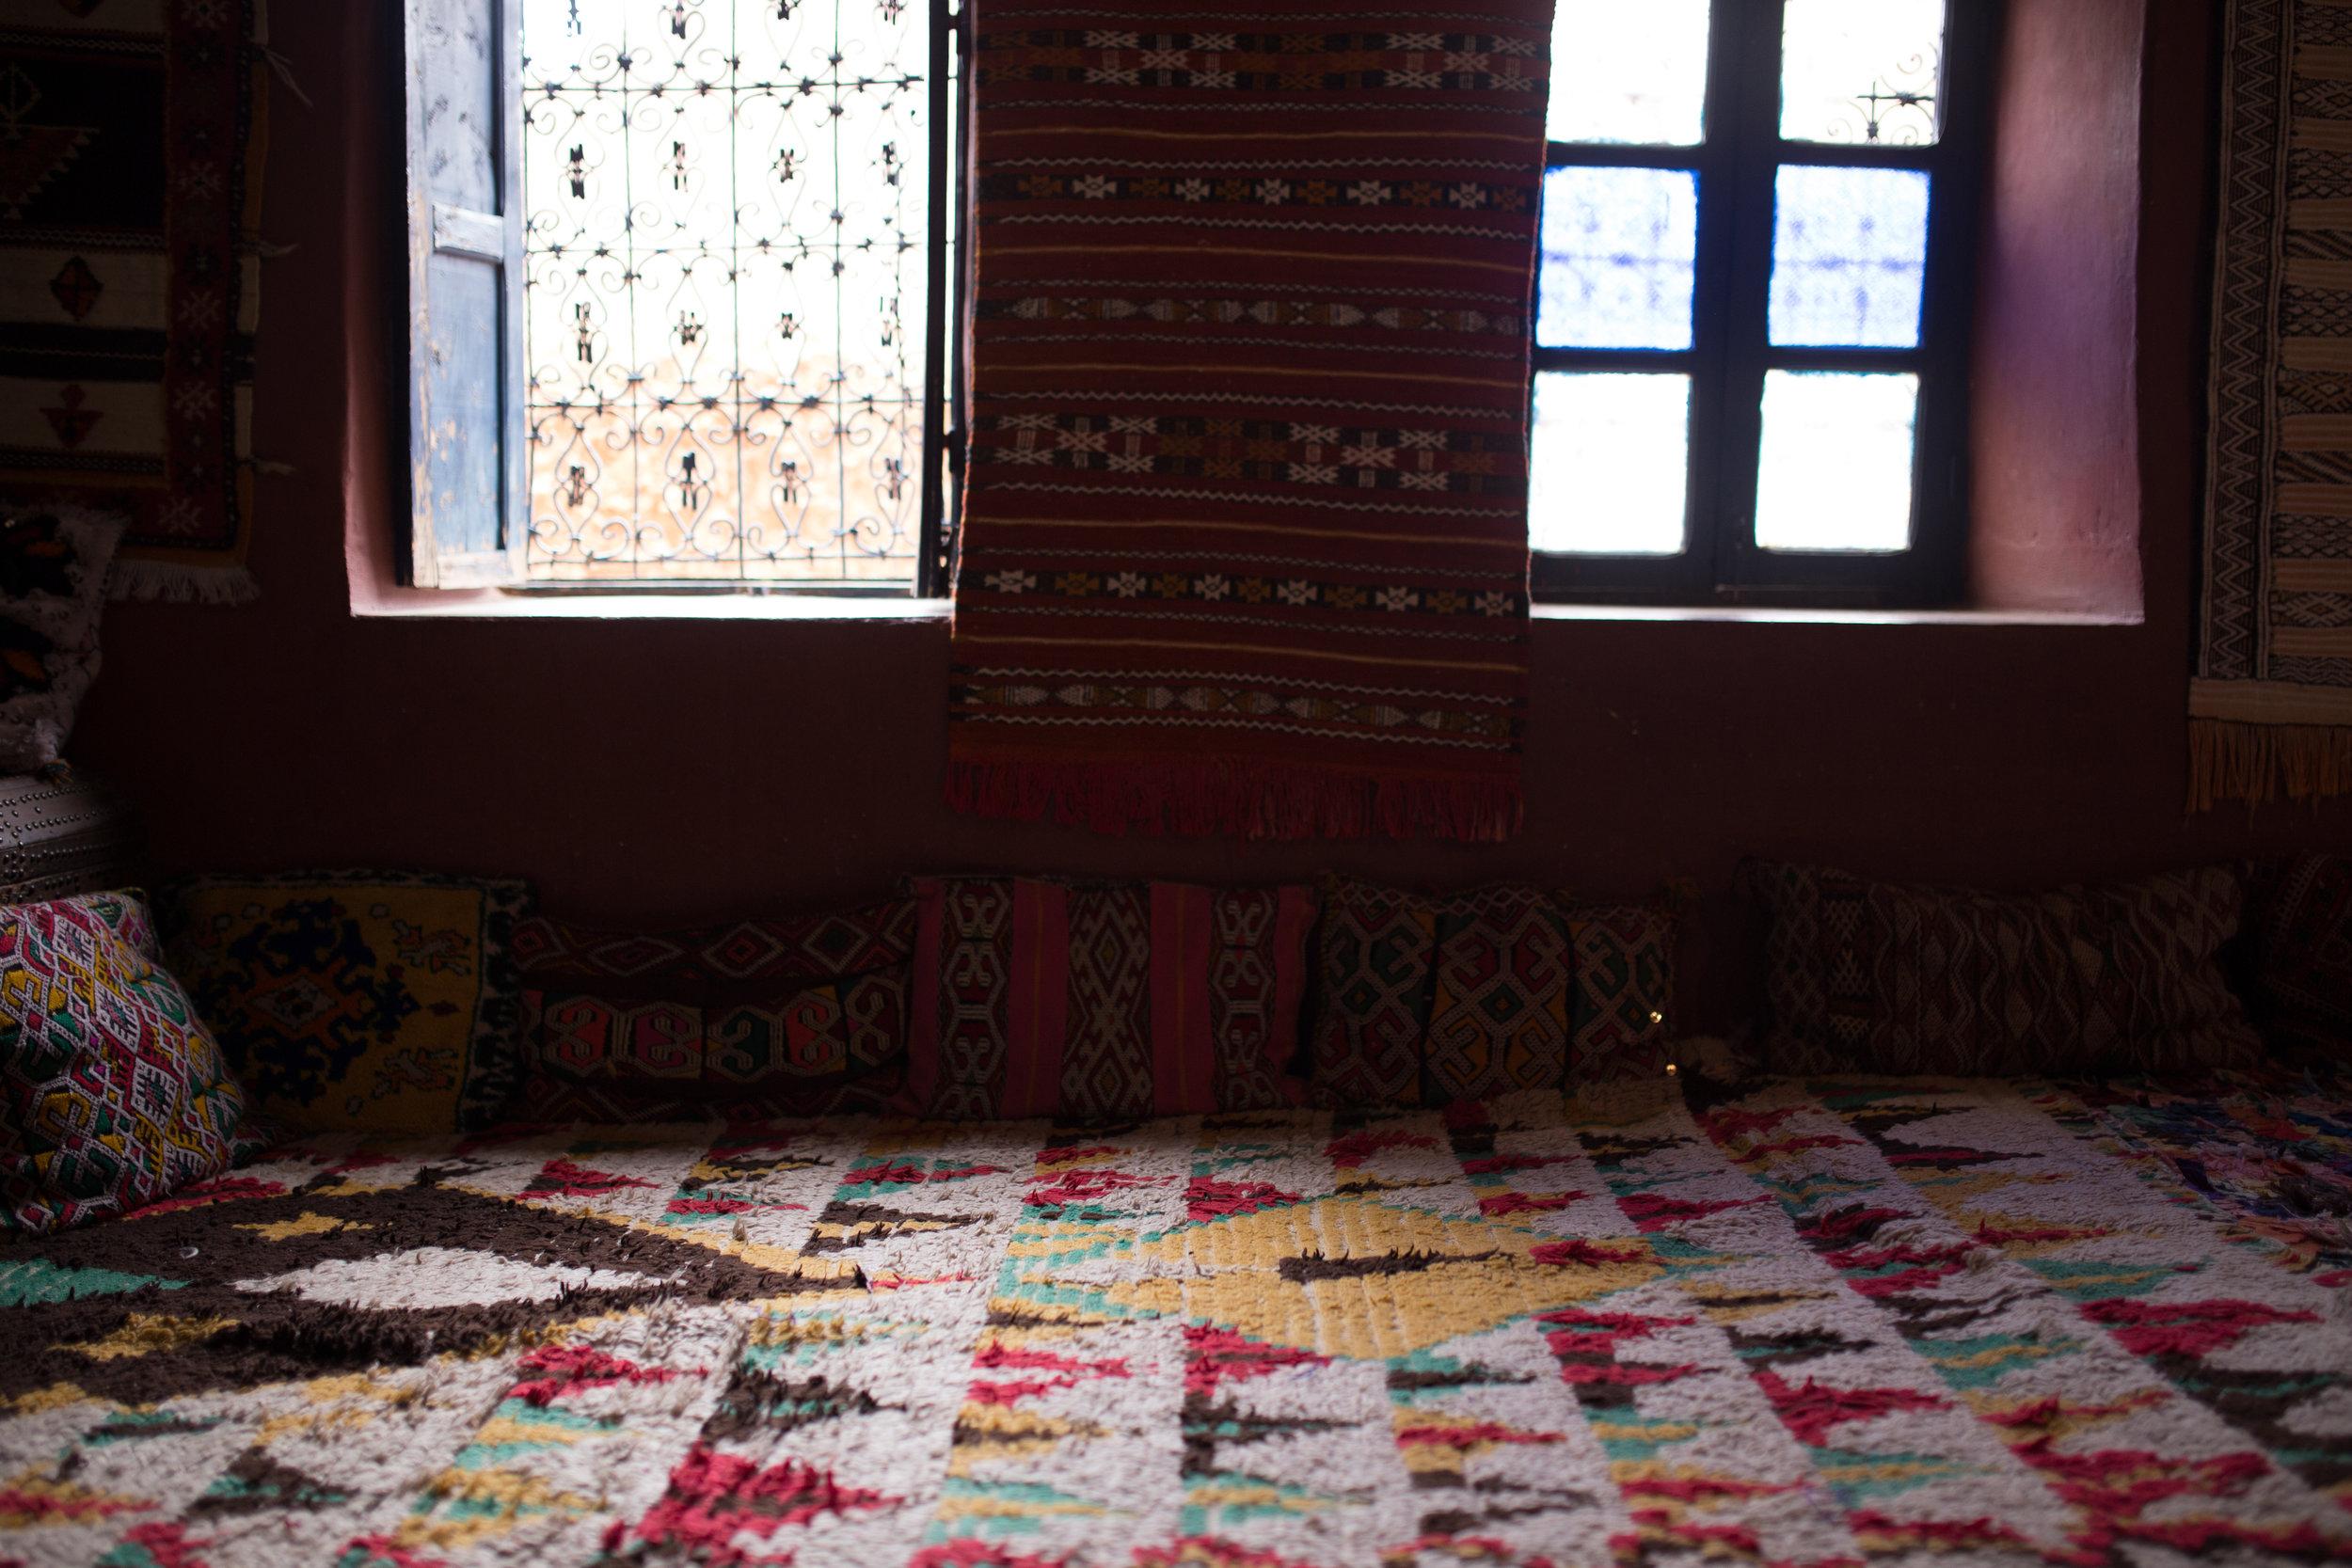 morocco-morocco travel-visit morocco-travel-travel photography-travel photographer-alina mendoza-alina mendoza photography-132.jpg